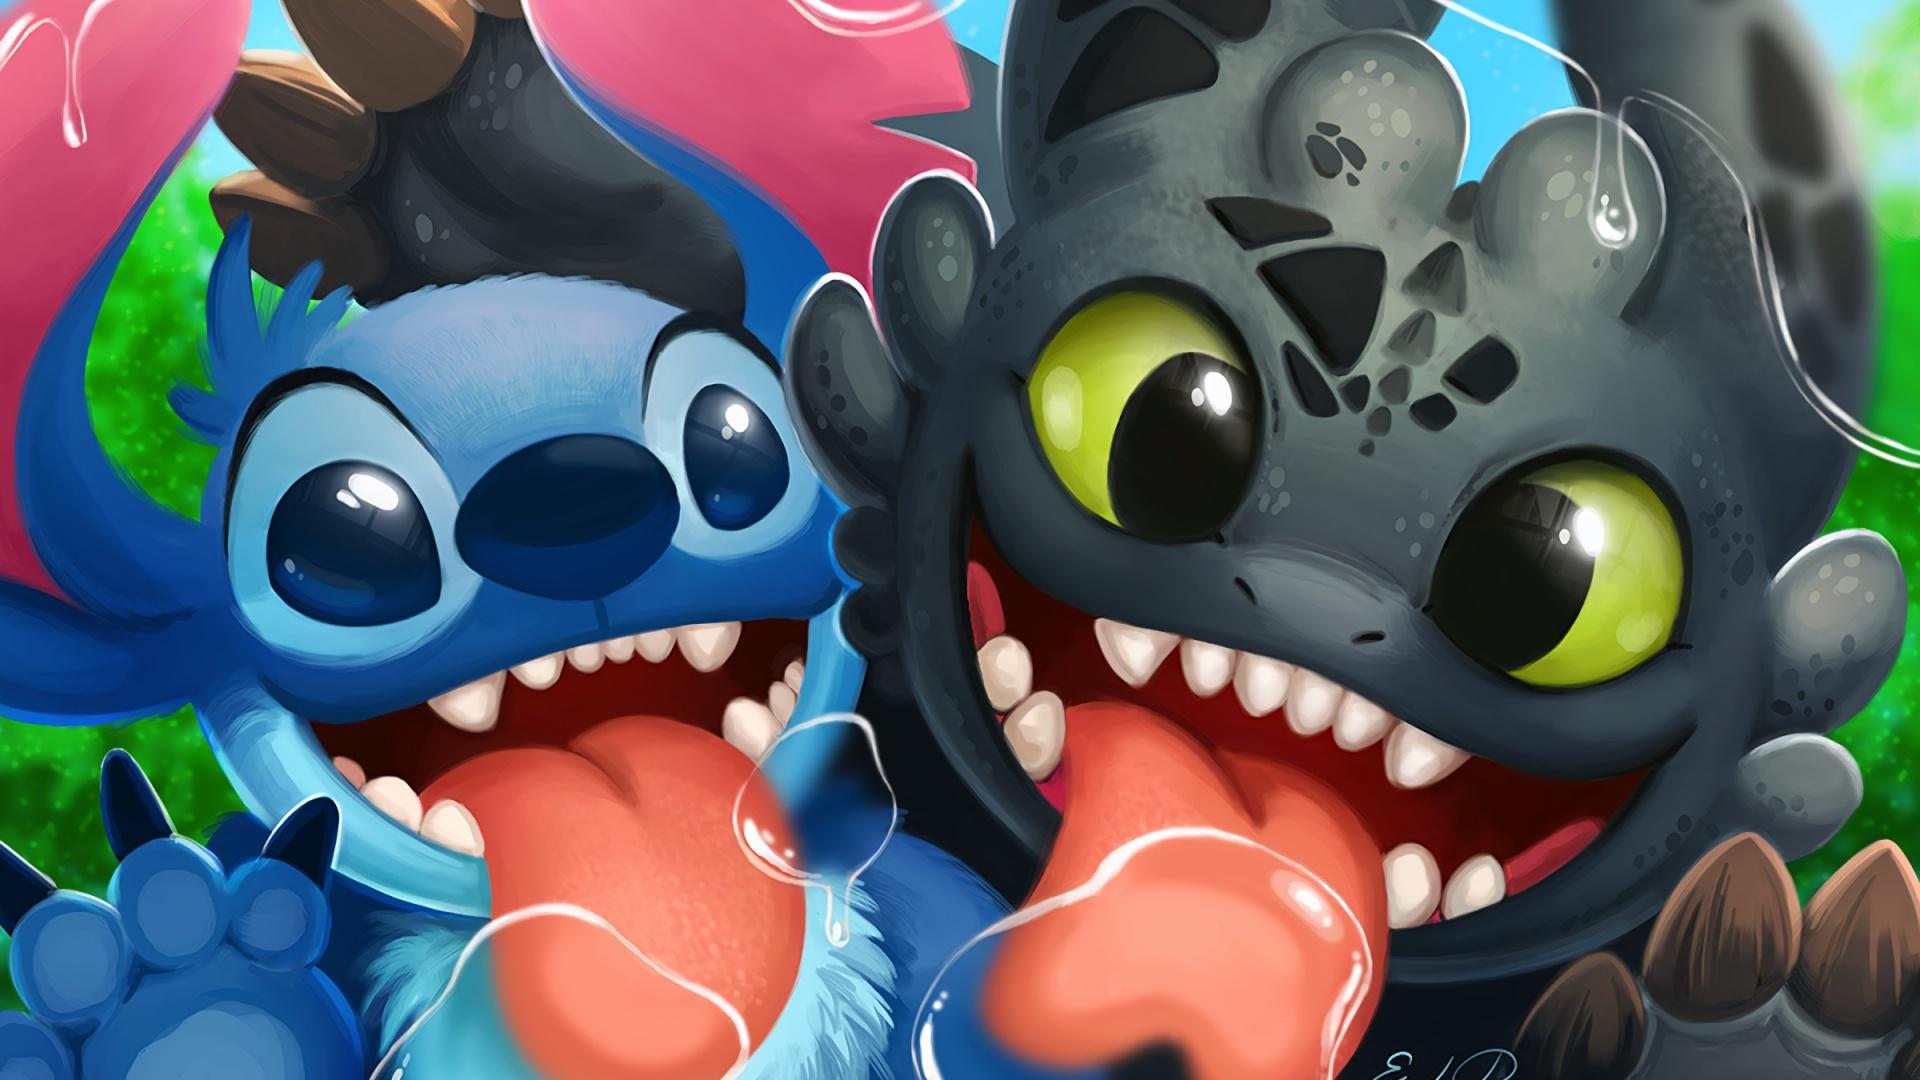 Stitch free background